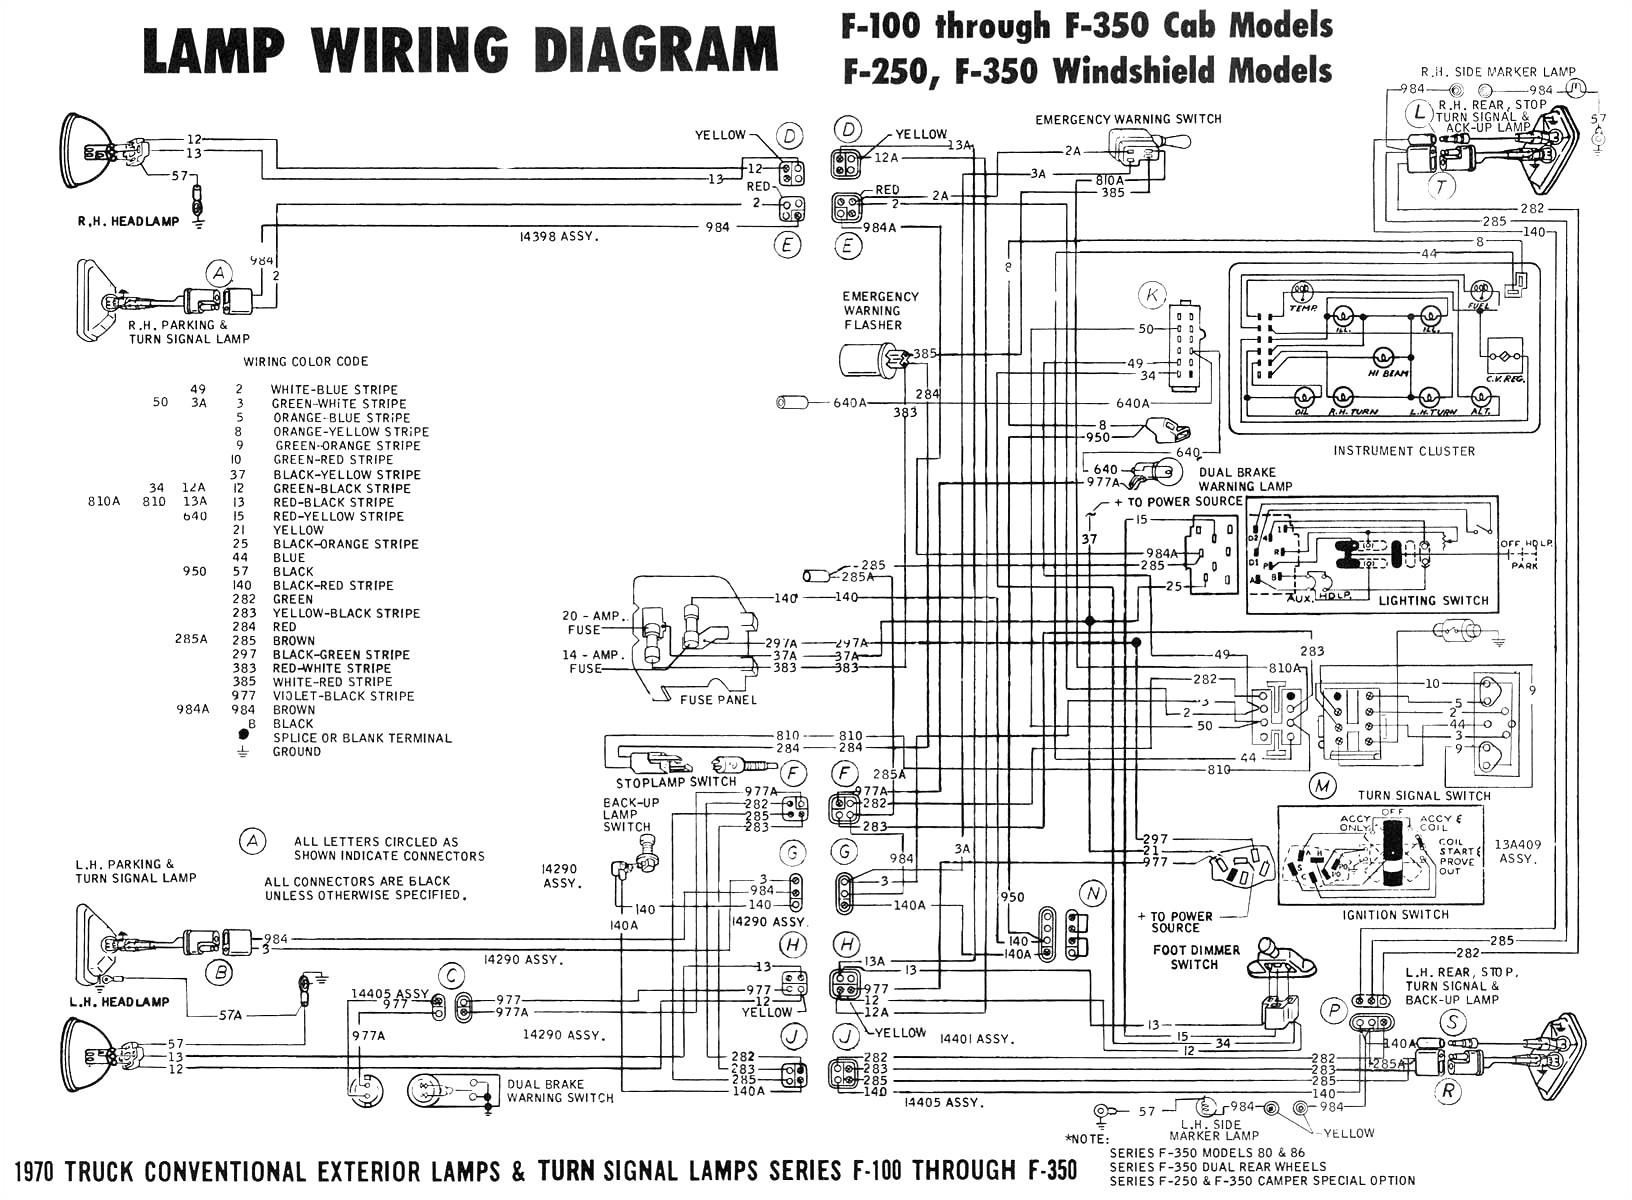 F 350 2008 Eec Diagram Wiring. fog light wiring diagram autocardesign. 2008  f350 radio wiring diagram autocardesign. 2008 ford f350 tail light wiring  diagram autocardesign. 2011 f350 upfitter wire diagram inspirational wiring.